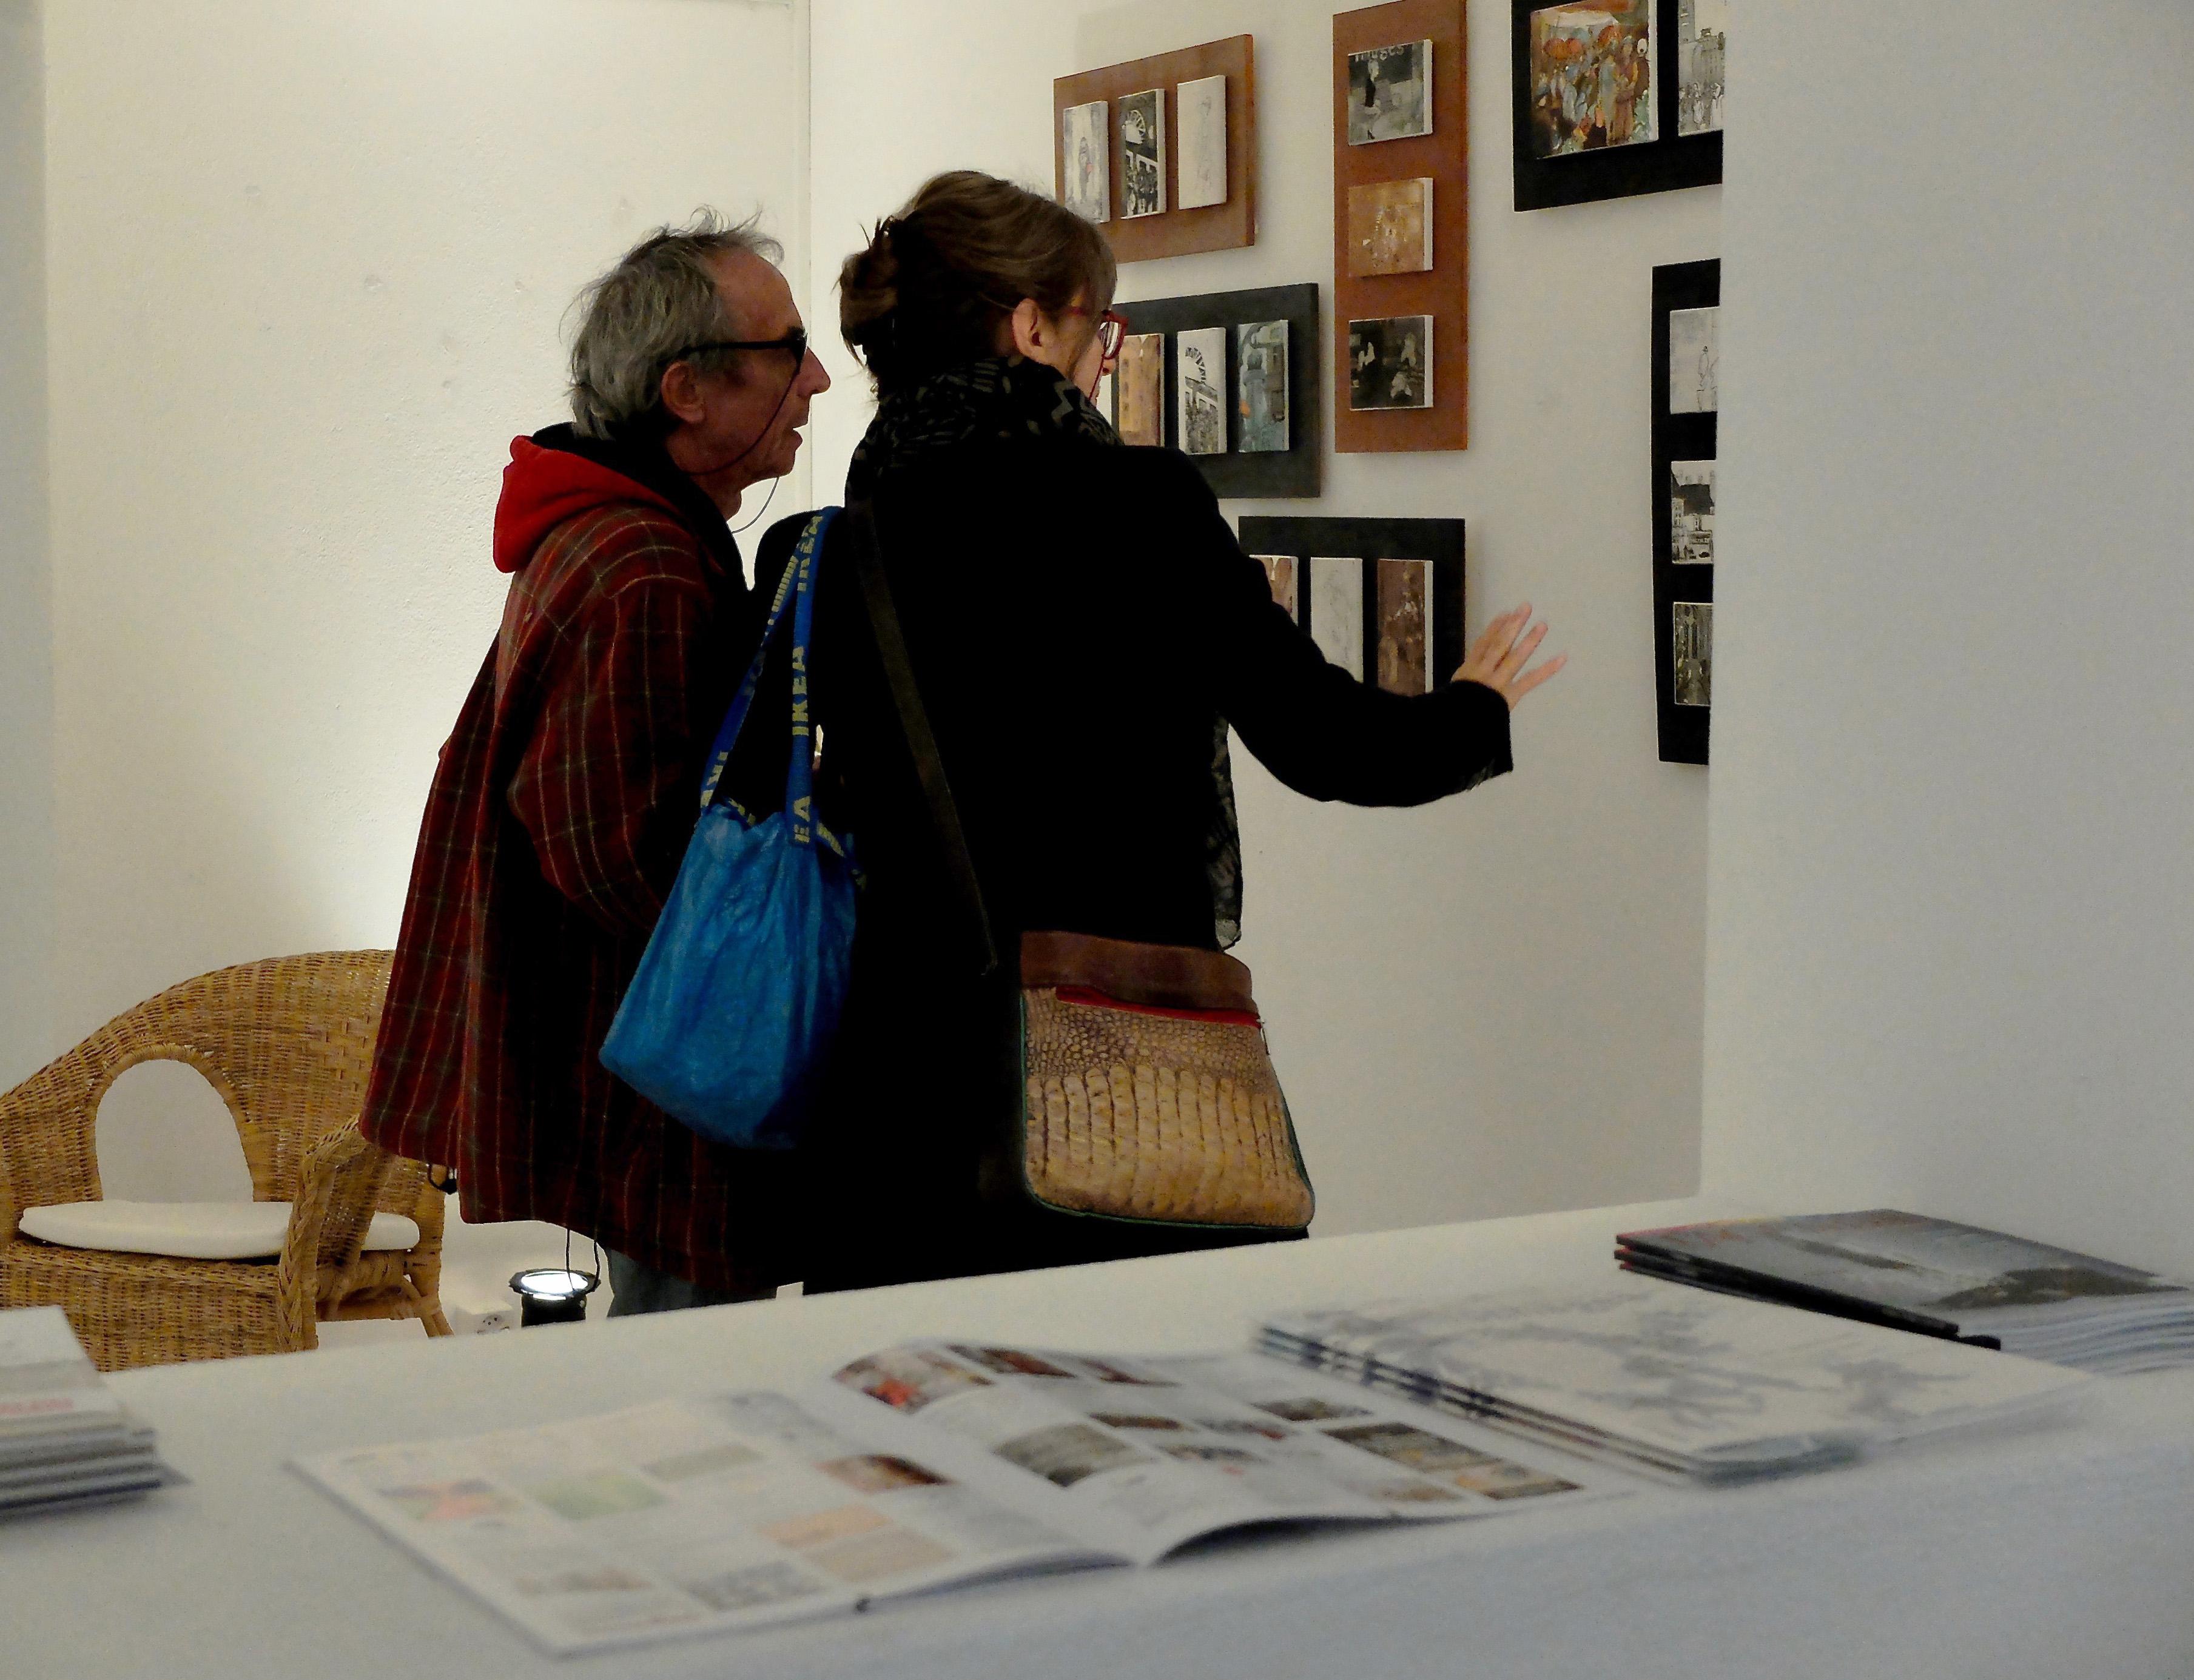 Atelier d'artiste – N. de Montmollin